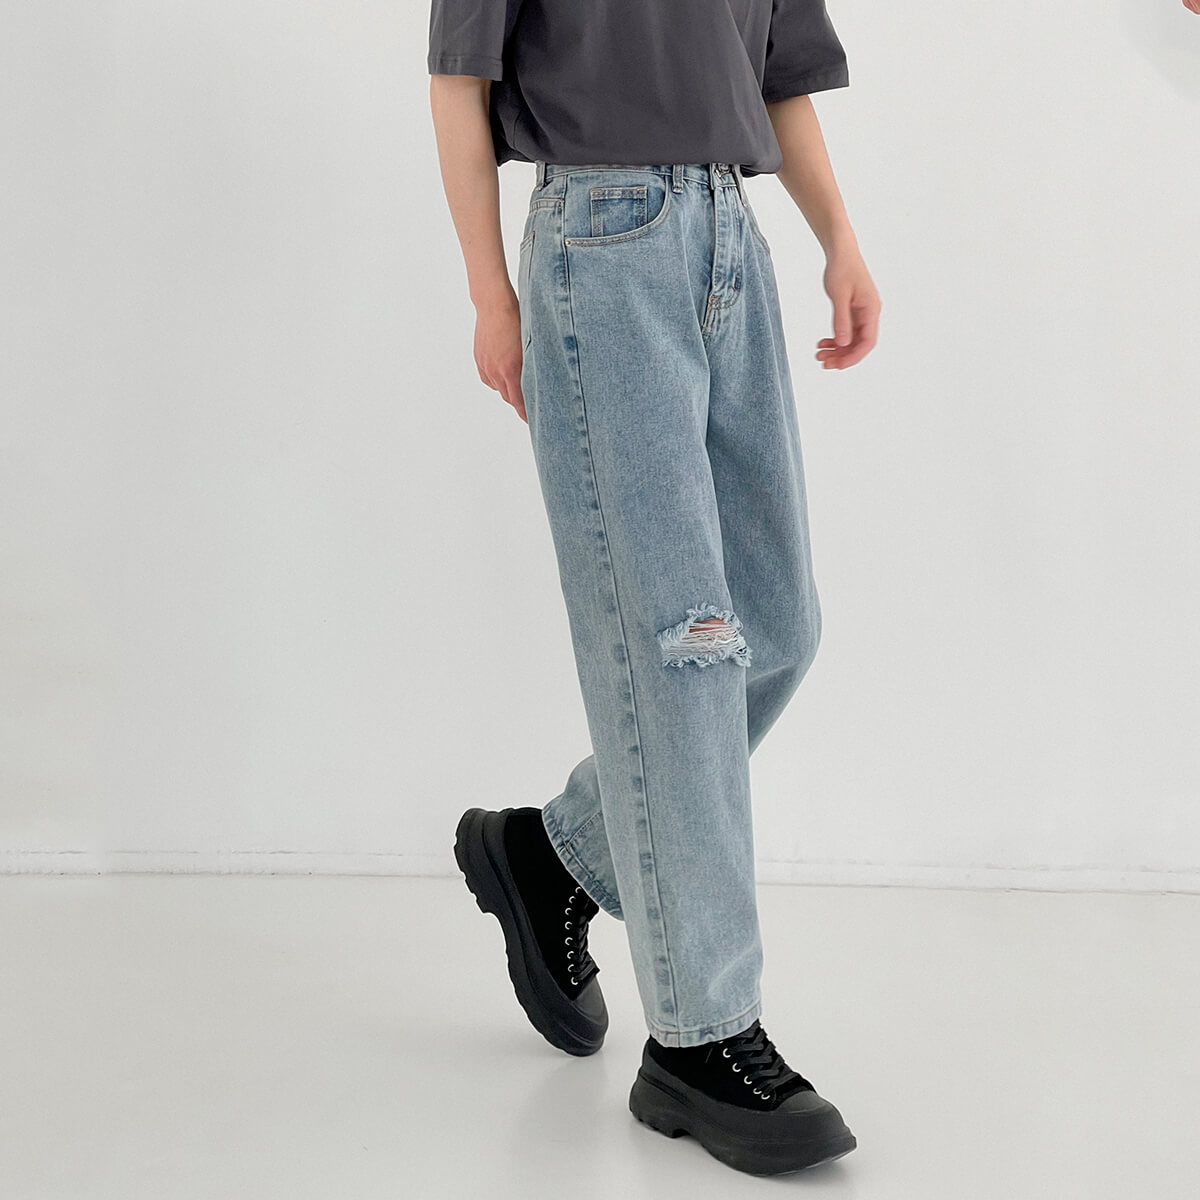 Джинсы DAZO Studio Straight Light Jeans Ripped Element (1)